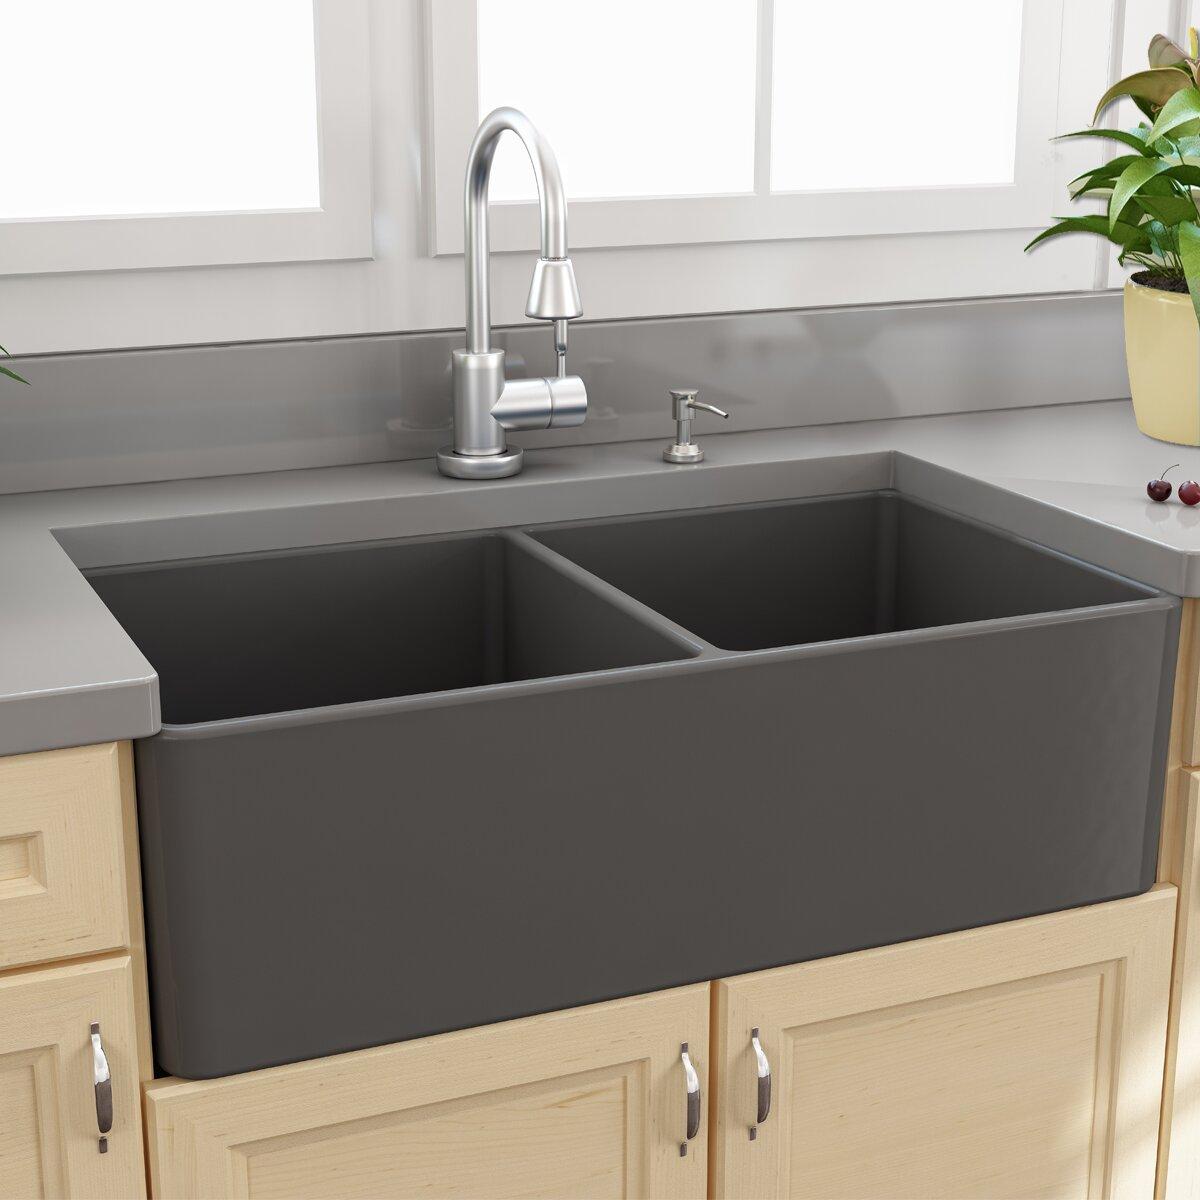 "Apron Kitchen Sink: Nantucket Sinks Cape 33.25"" X 18"" Double Bowl Apron"